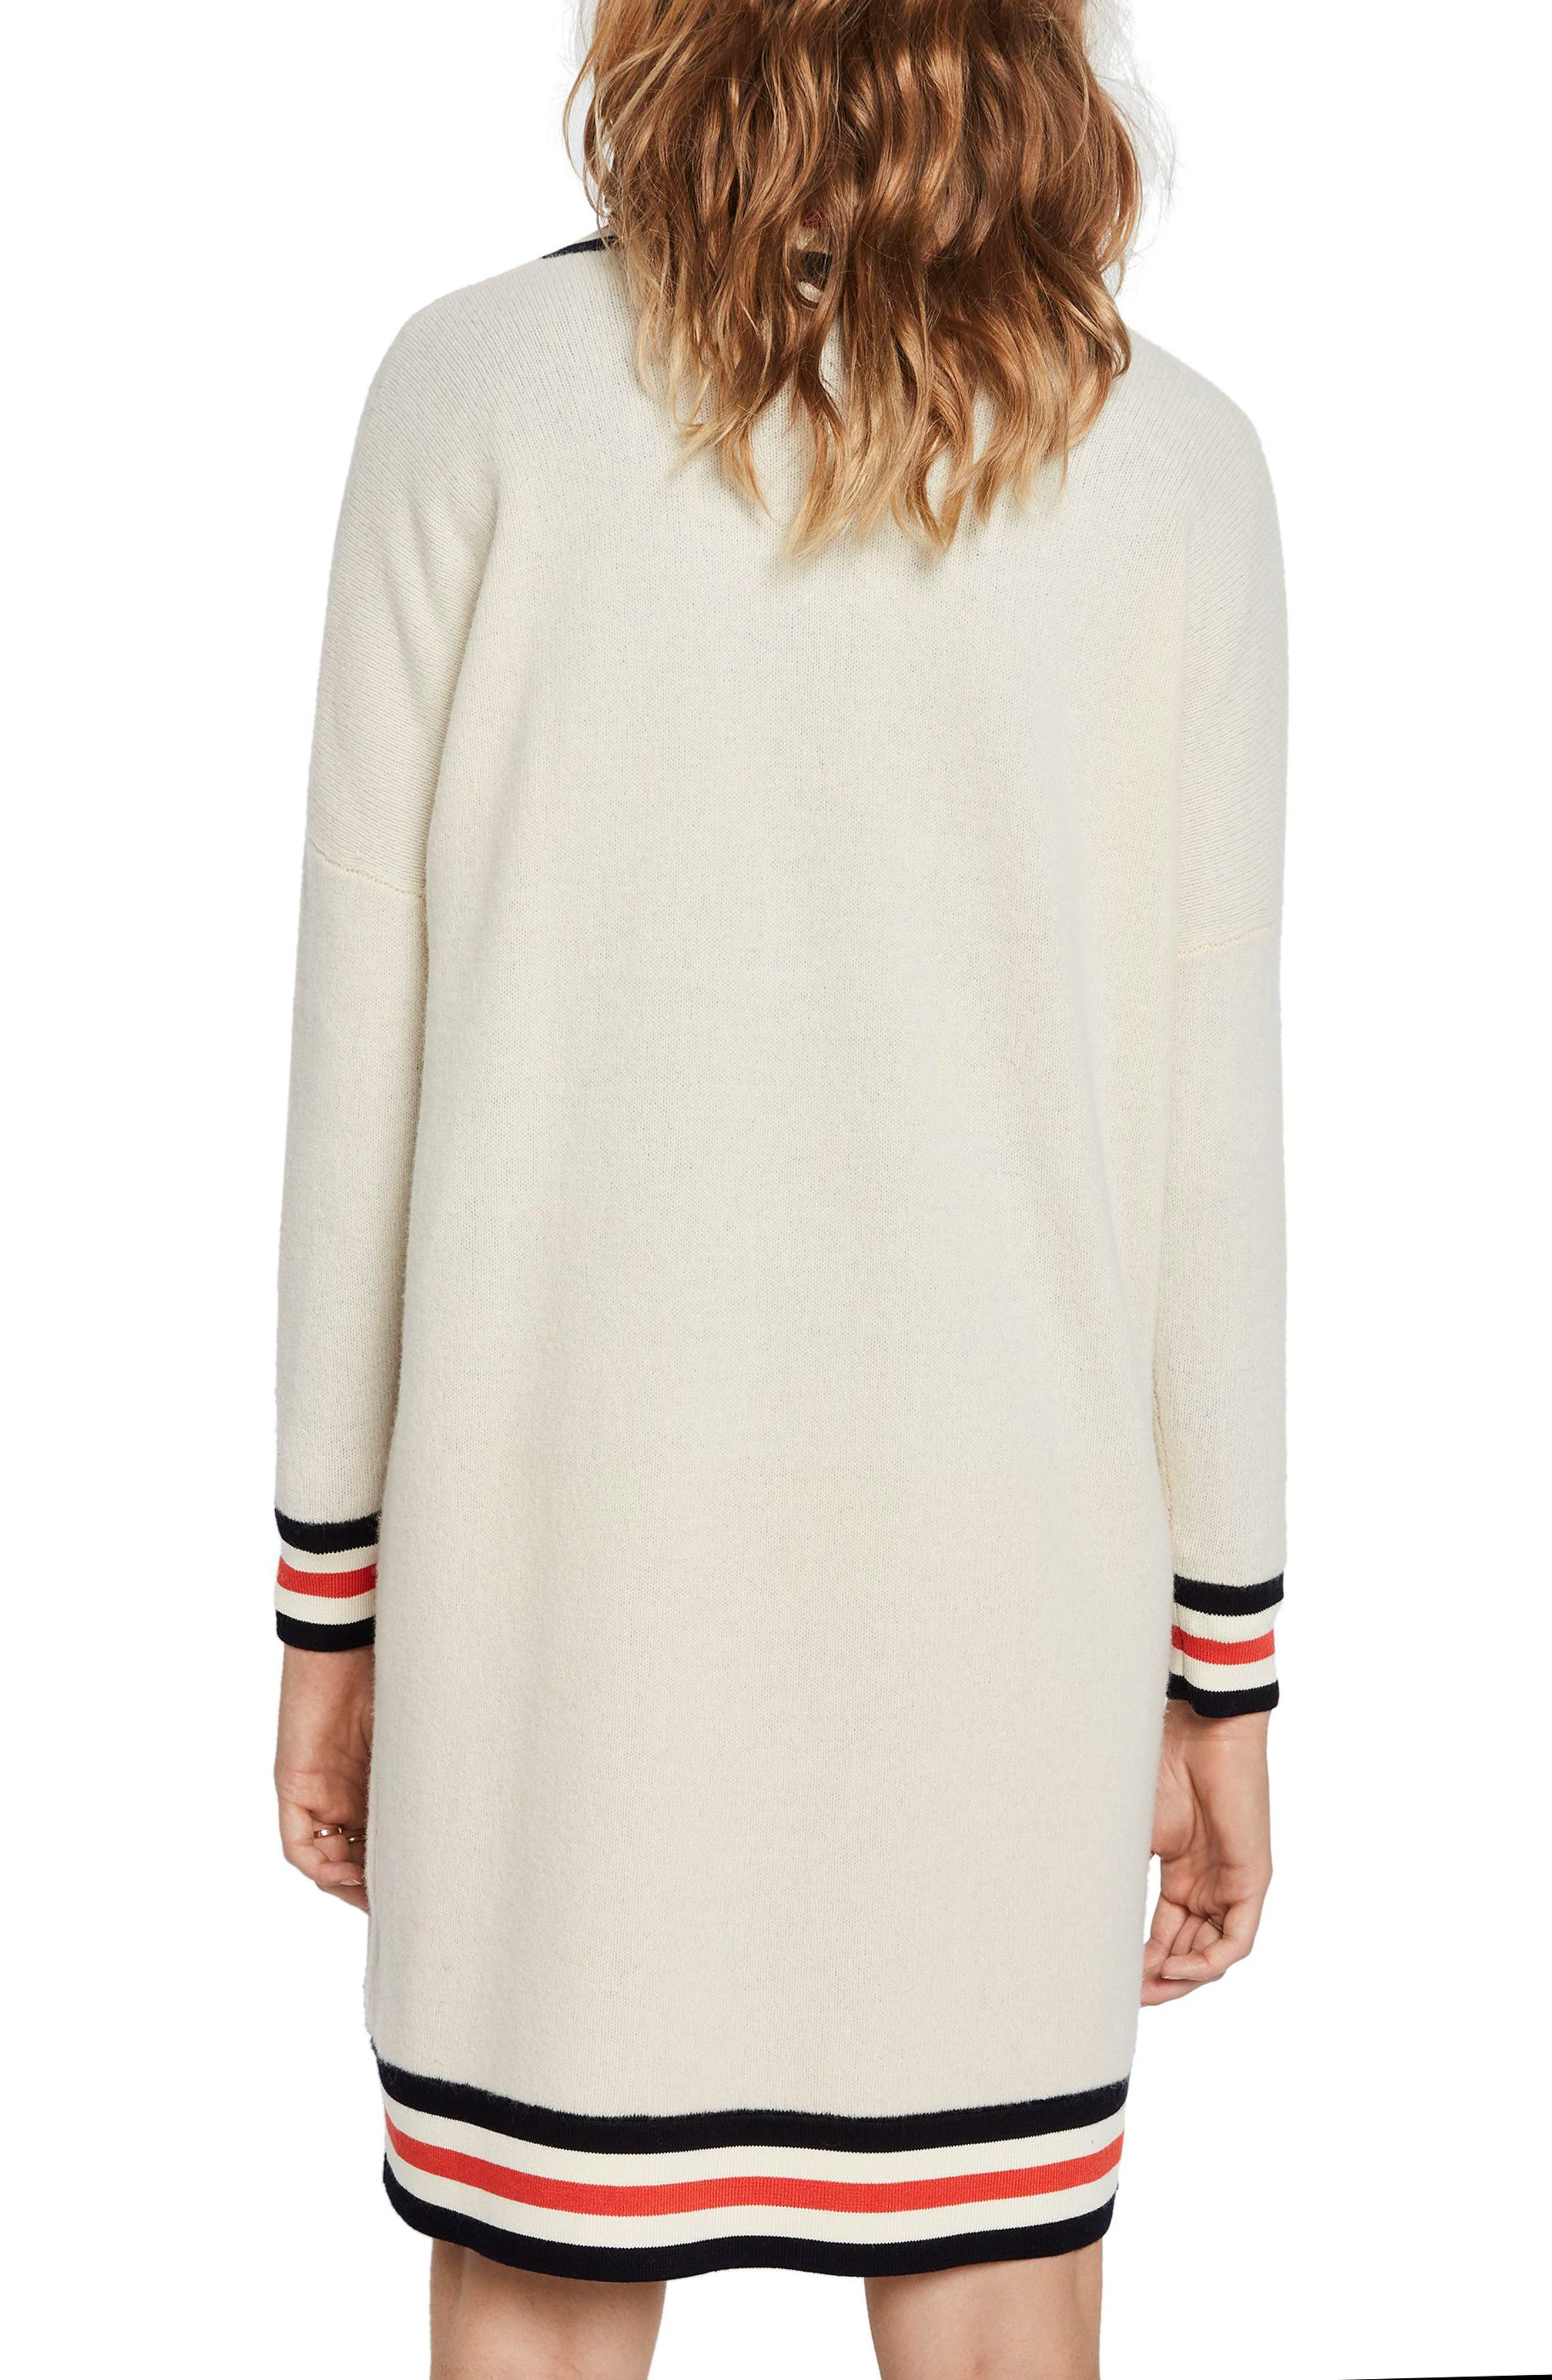 SCOTCH & SODA, Luxury Lambswool Longline Sweater, Alternate thumbnail 2, color, 250